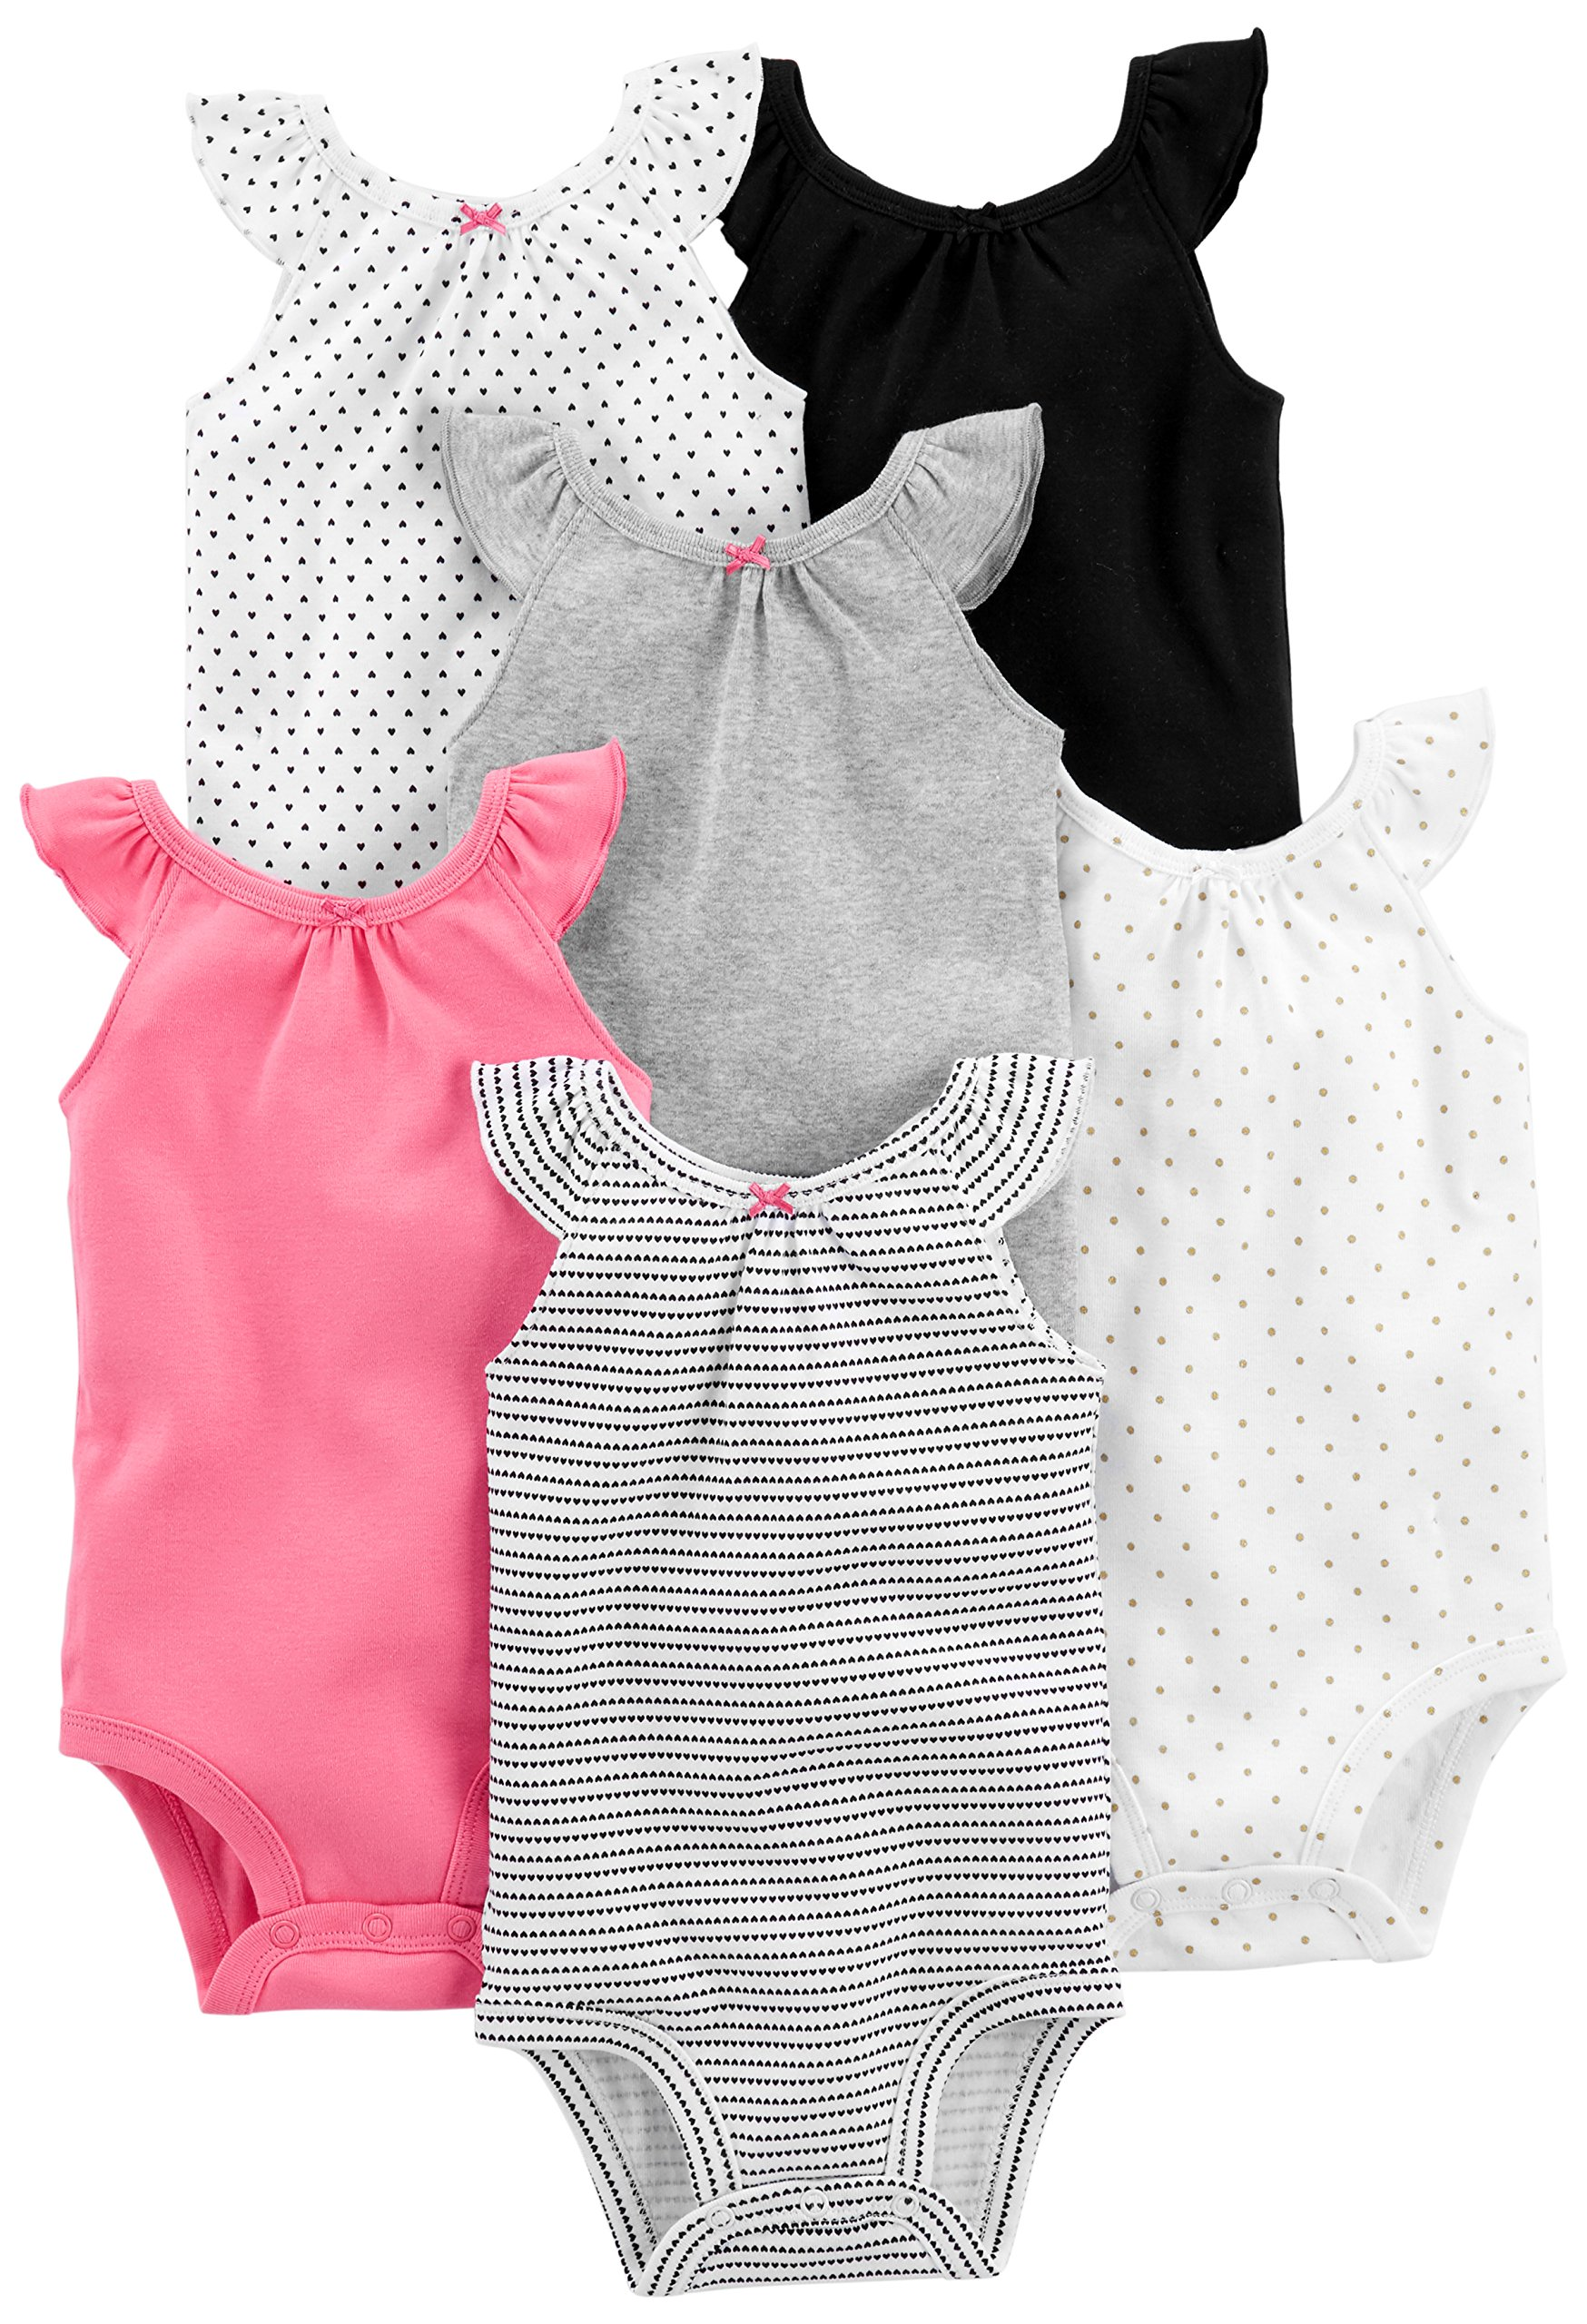 Simple Joys by Carter's Baby Girls' 6-Pack Sleeveless Bodysuit, Black, White Pink Ruffle, 6-9 Months